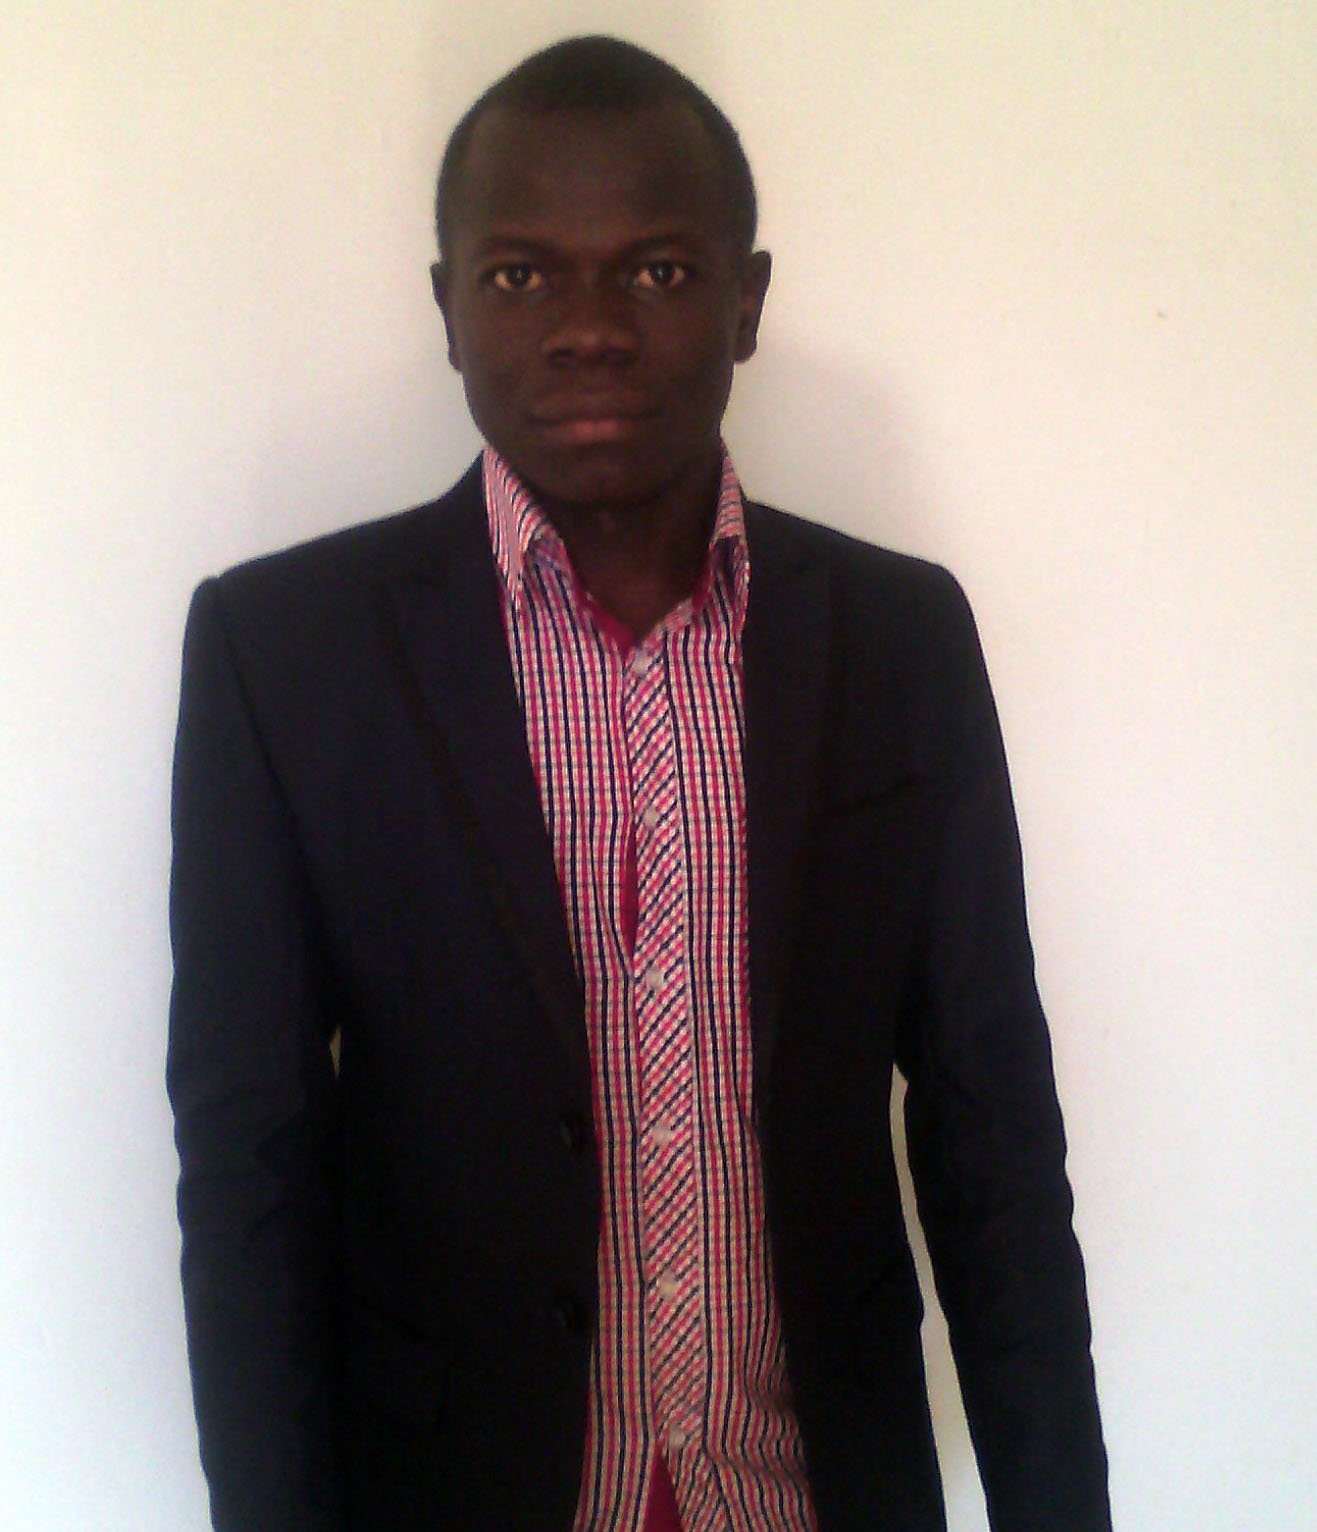 derrick_wanjala.jpg__1317x1532_q85_crop_subsampling-2_upscale.jpg